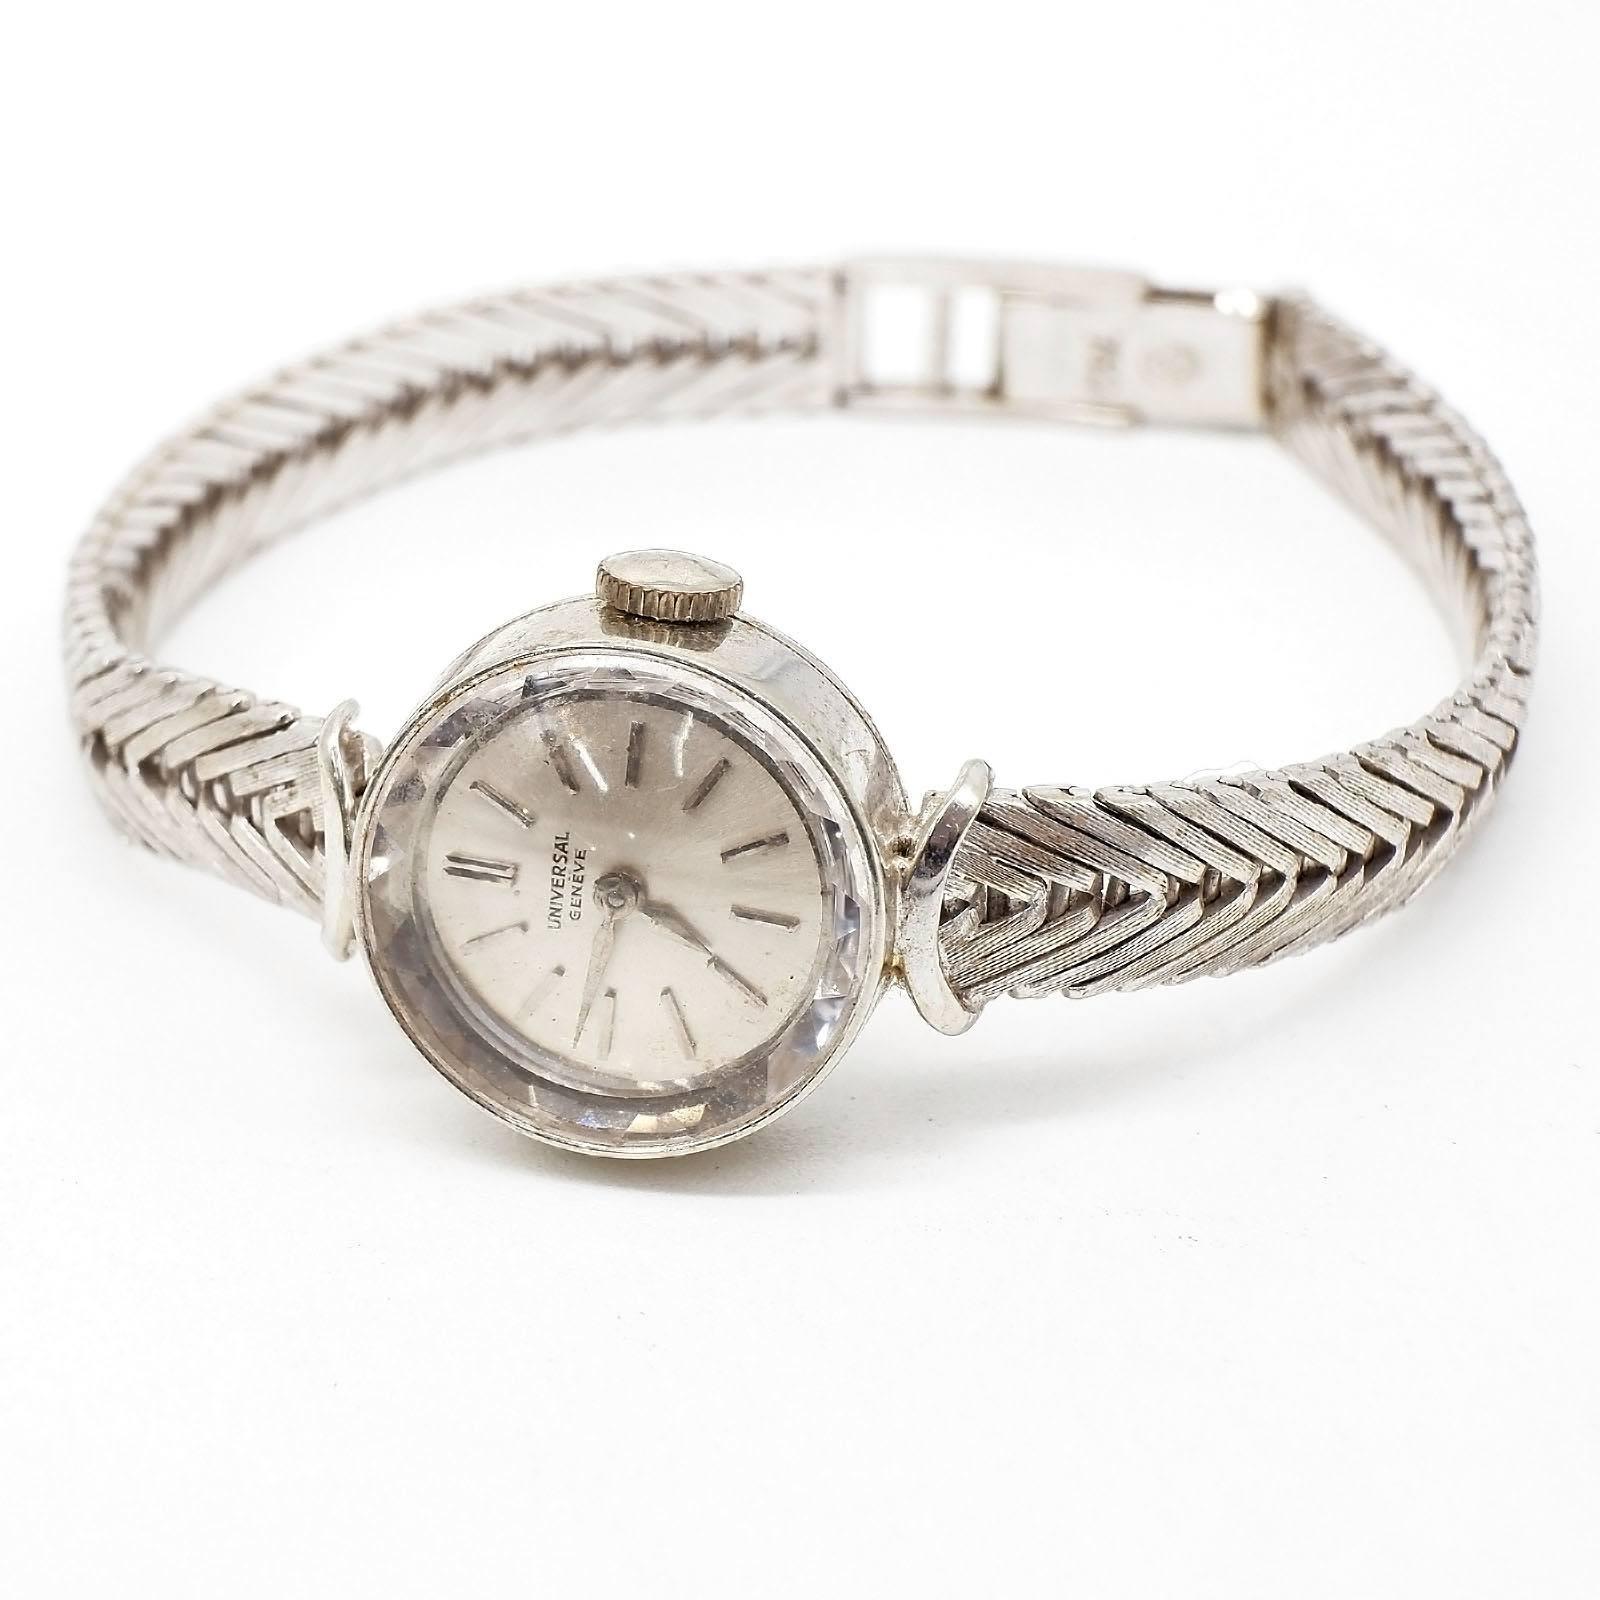 '18ct White Gold Swiss Universal Ladies Wrist Watch, 18.5g'